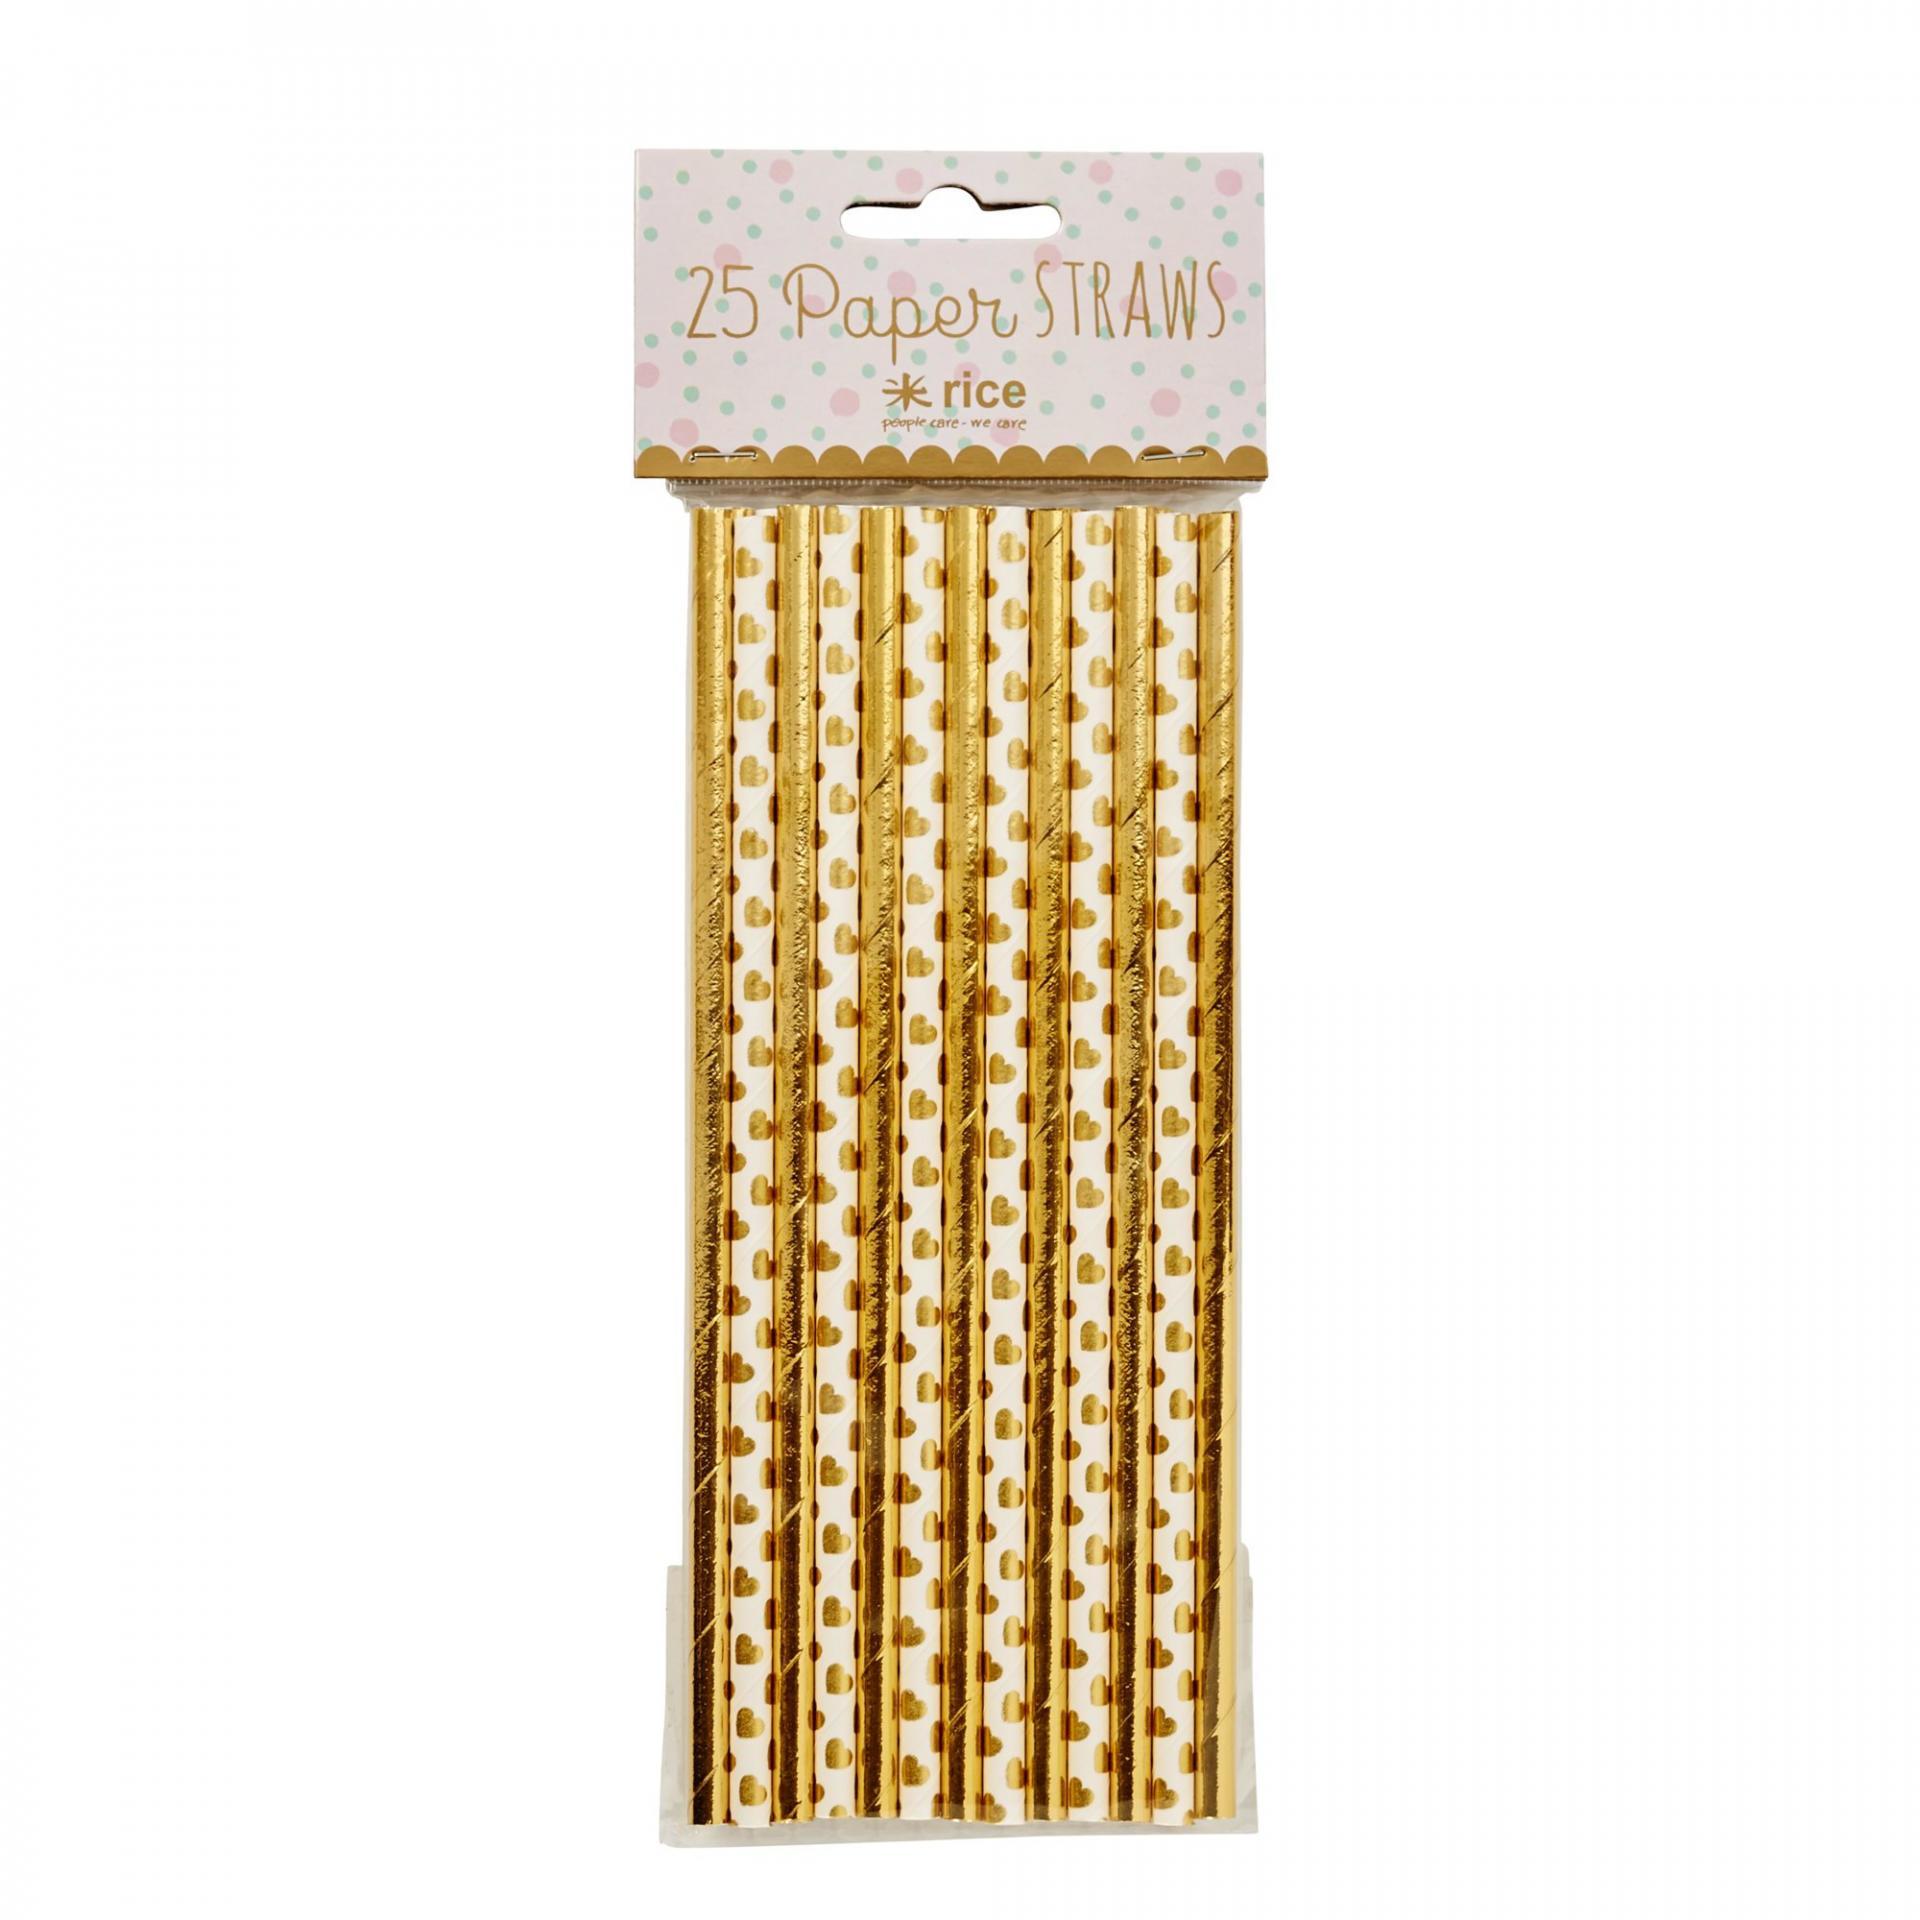 Rice Papírové slámky Gold - set 25 ks, bílá barva, zlatá barva, papír